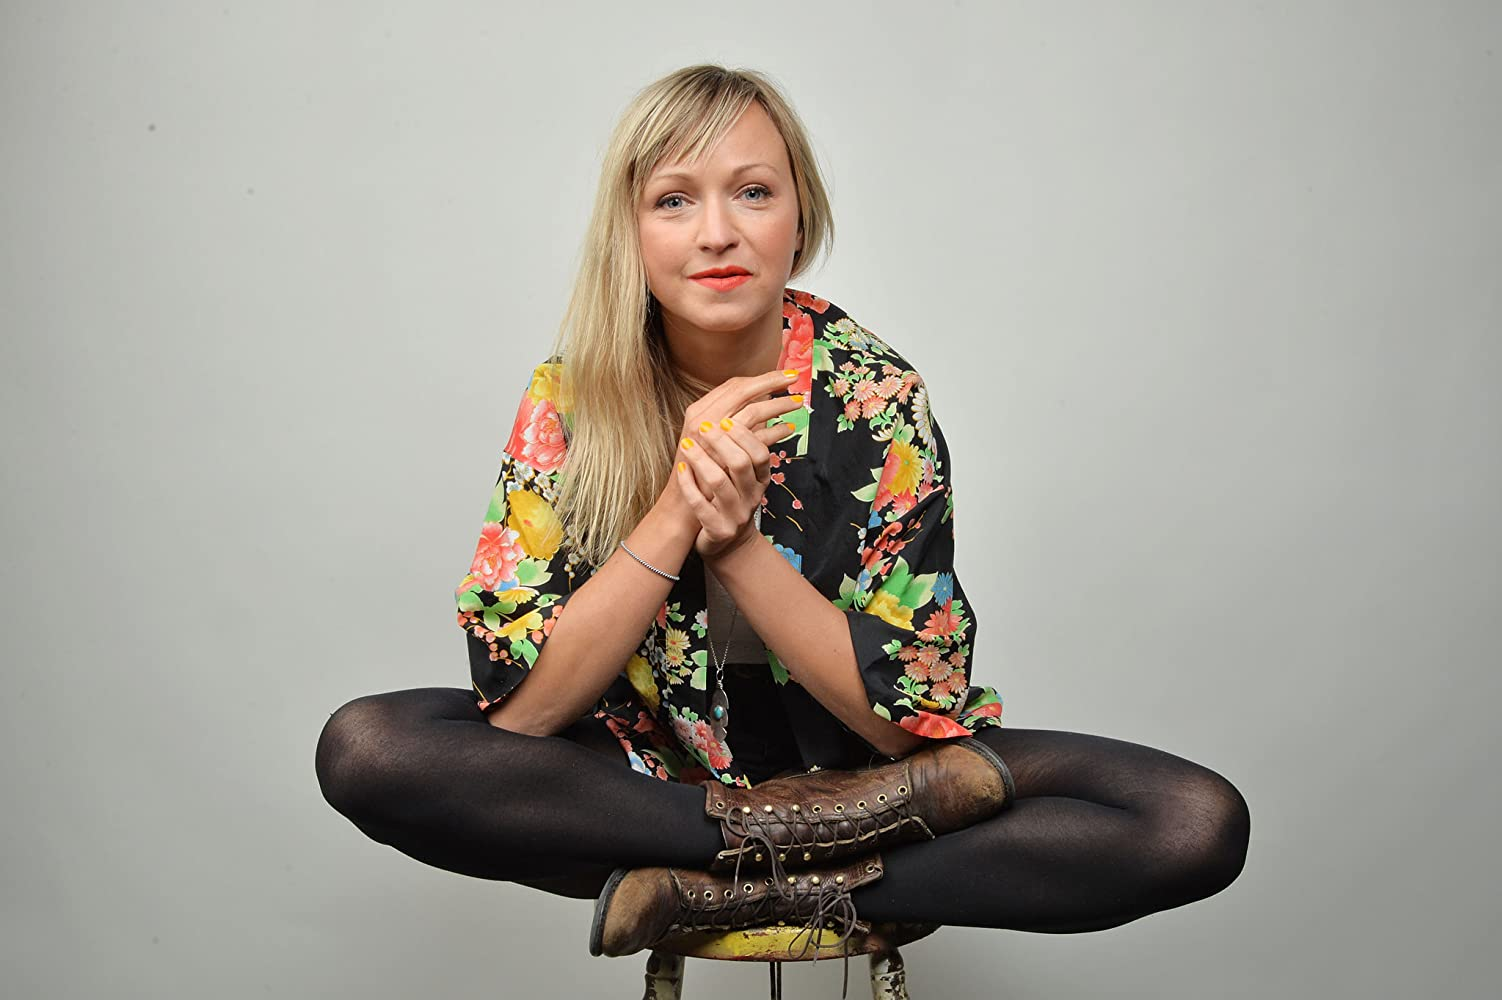 Forum on this topic: Shakira Caine, ashleigh-ball/